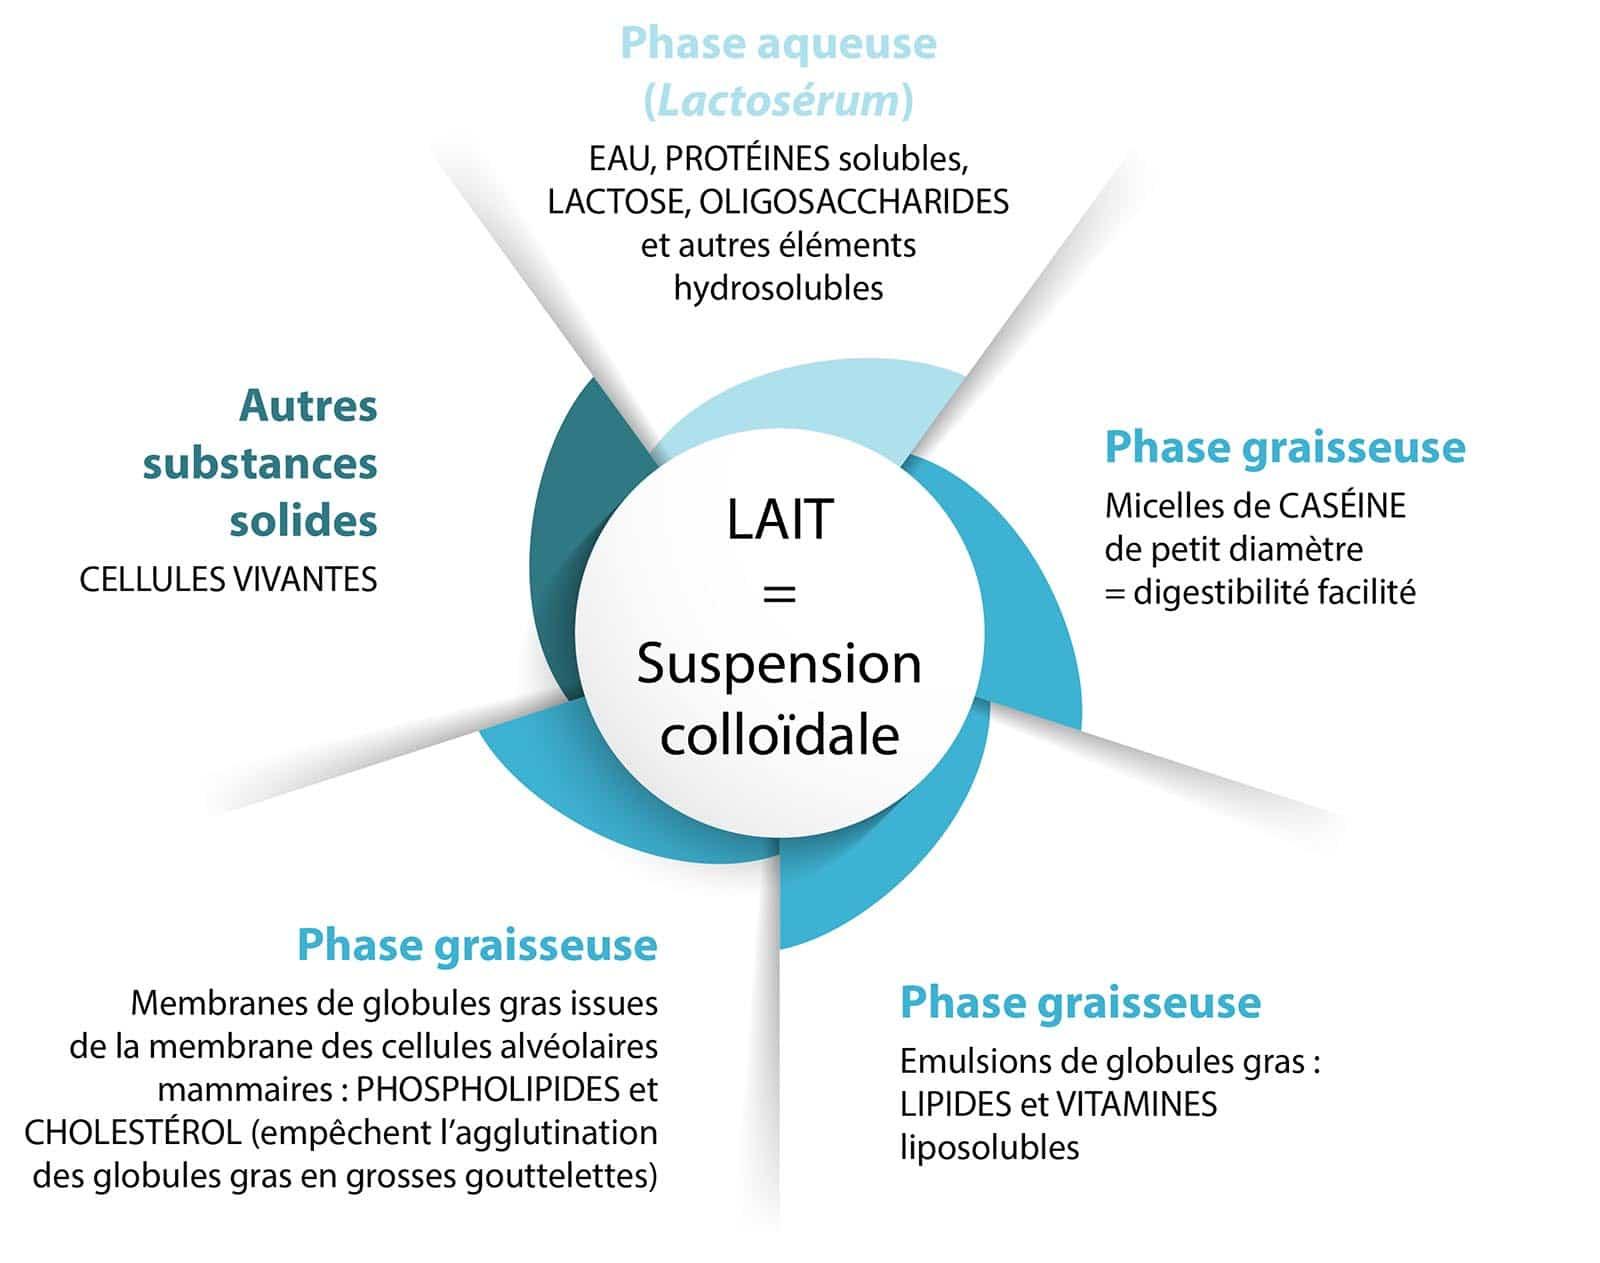 lait_suspension_colloidale_Nutrixeal-Info